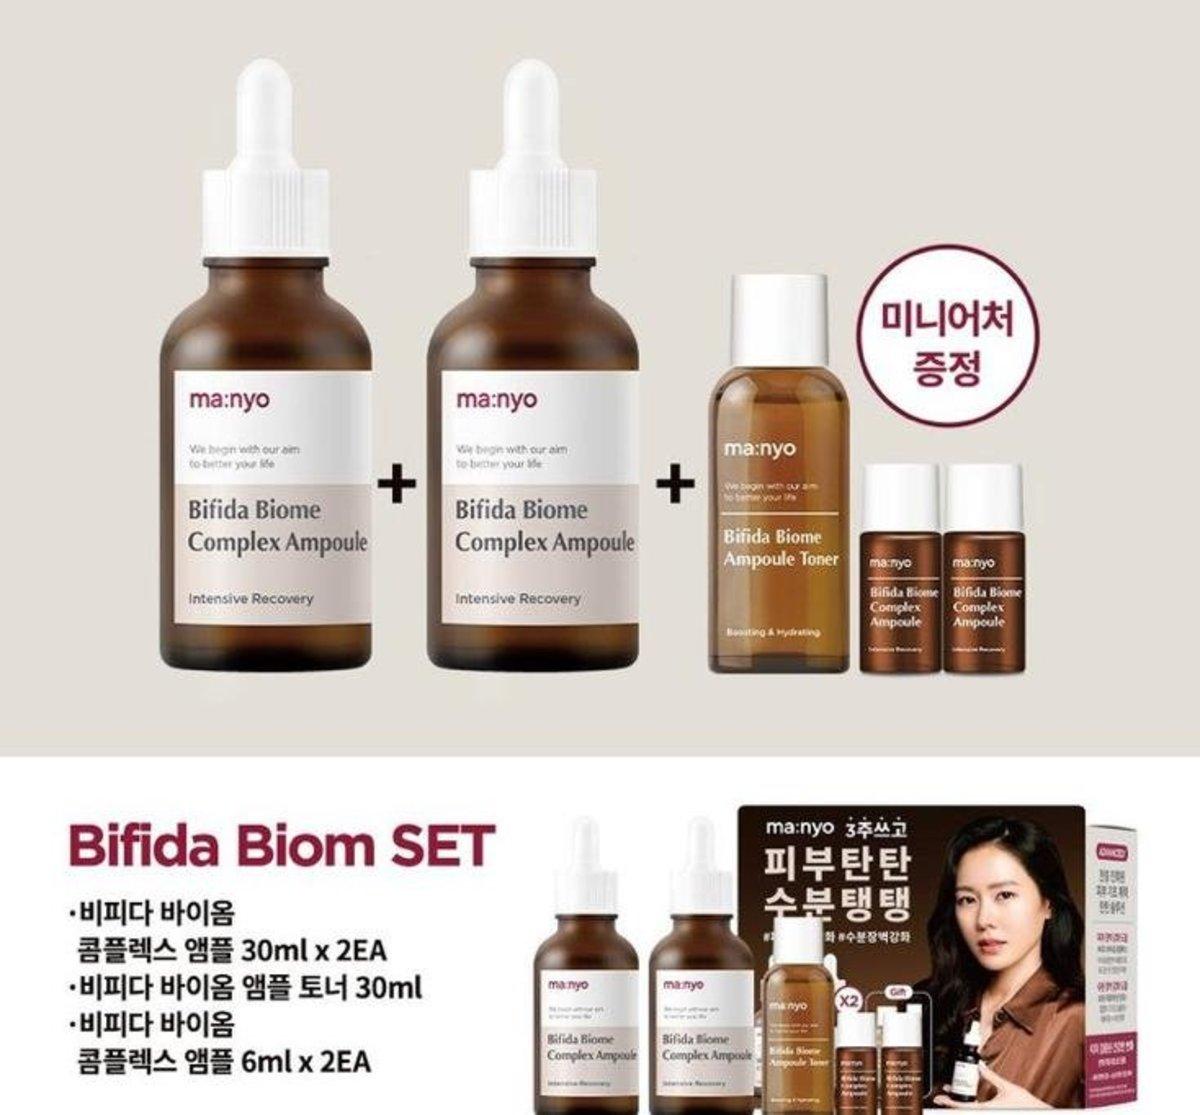 MANYO美女工廠 Bifida Biome逆轉時光再生Set (5件裝)